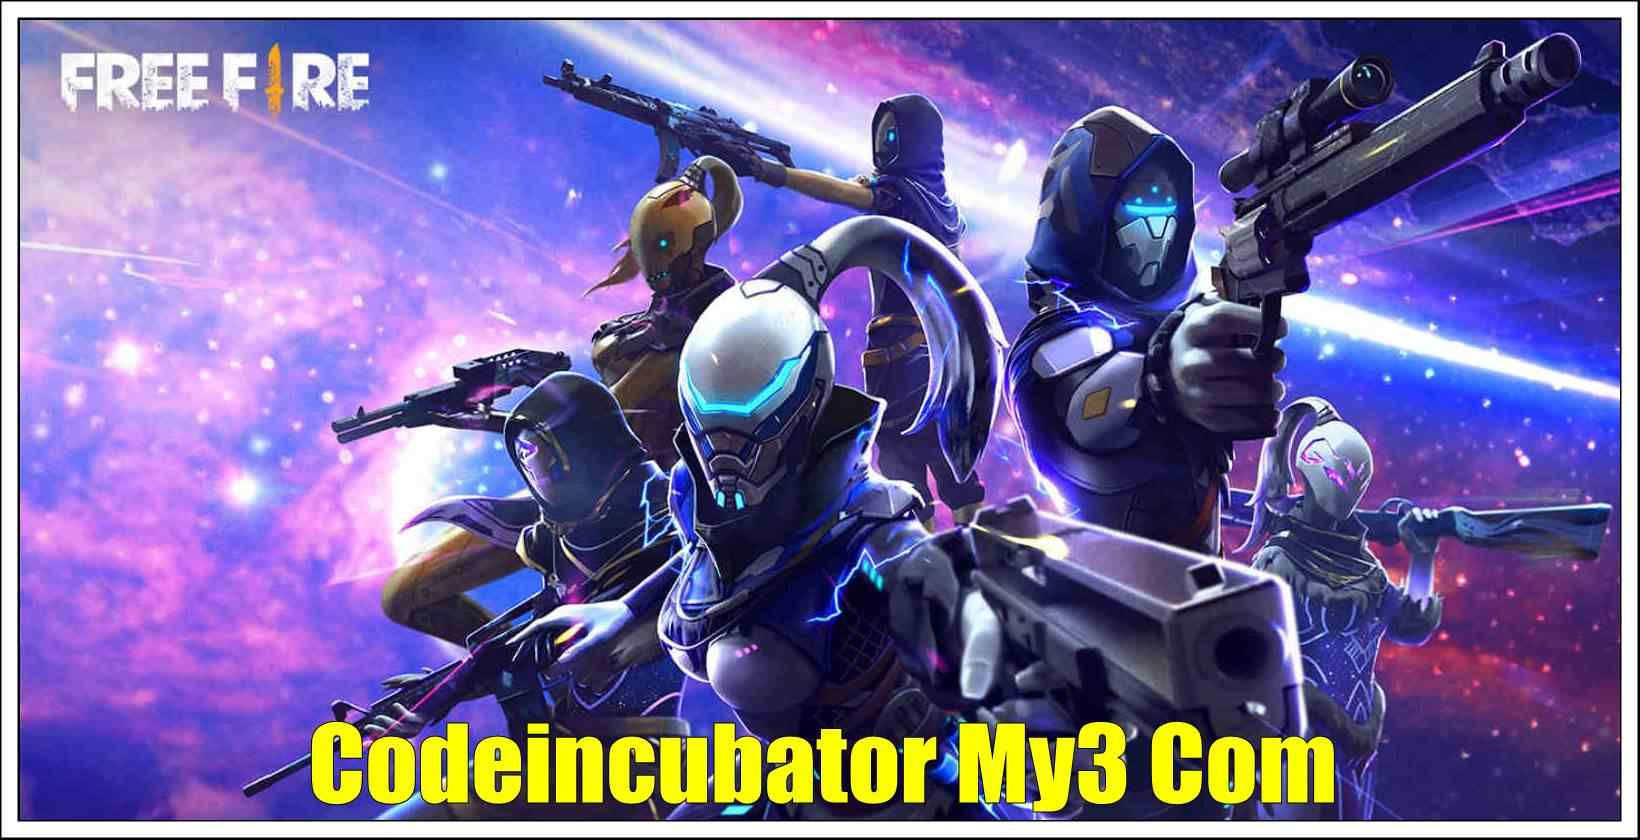 Codeincubator My3 Com